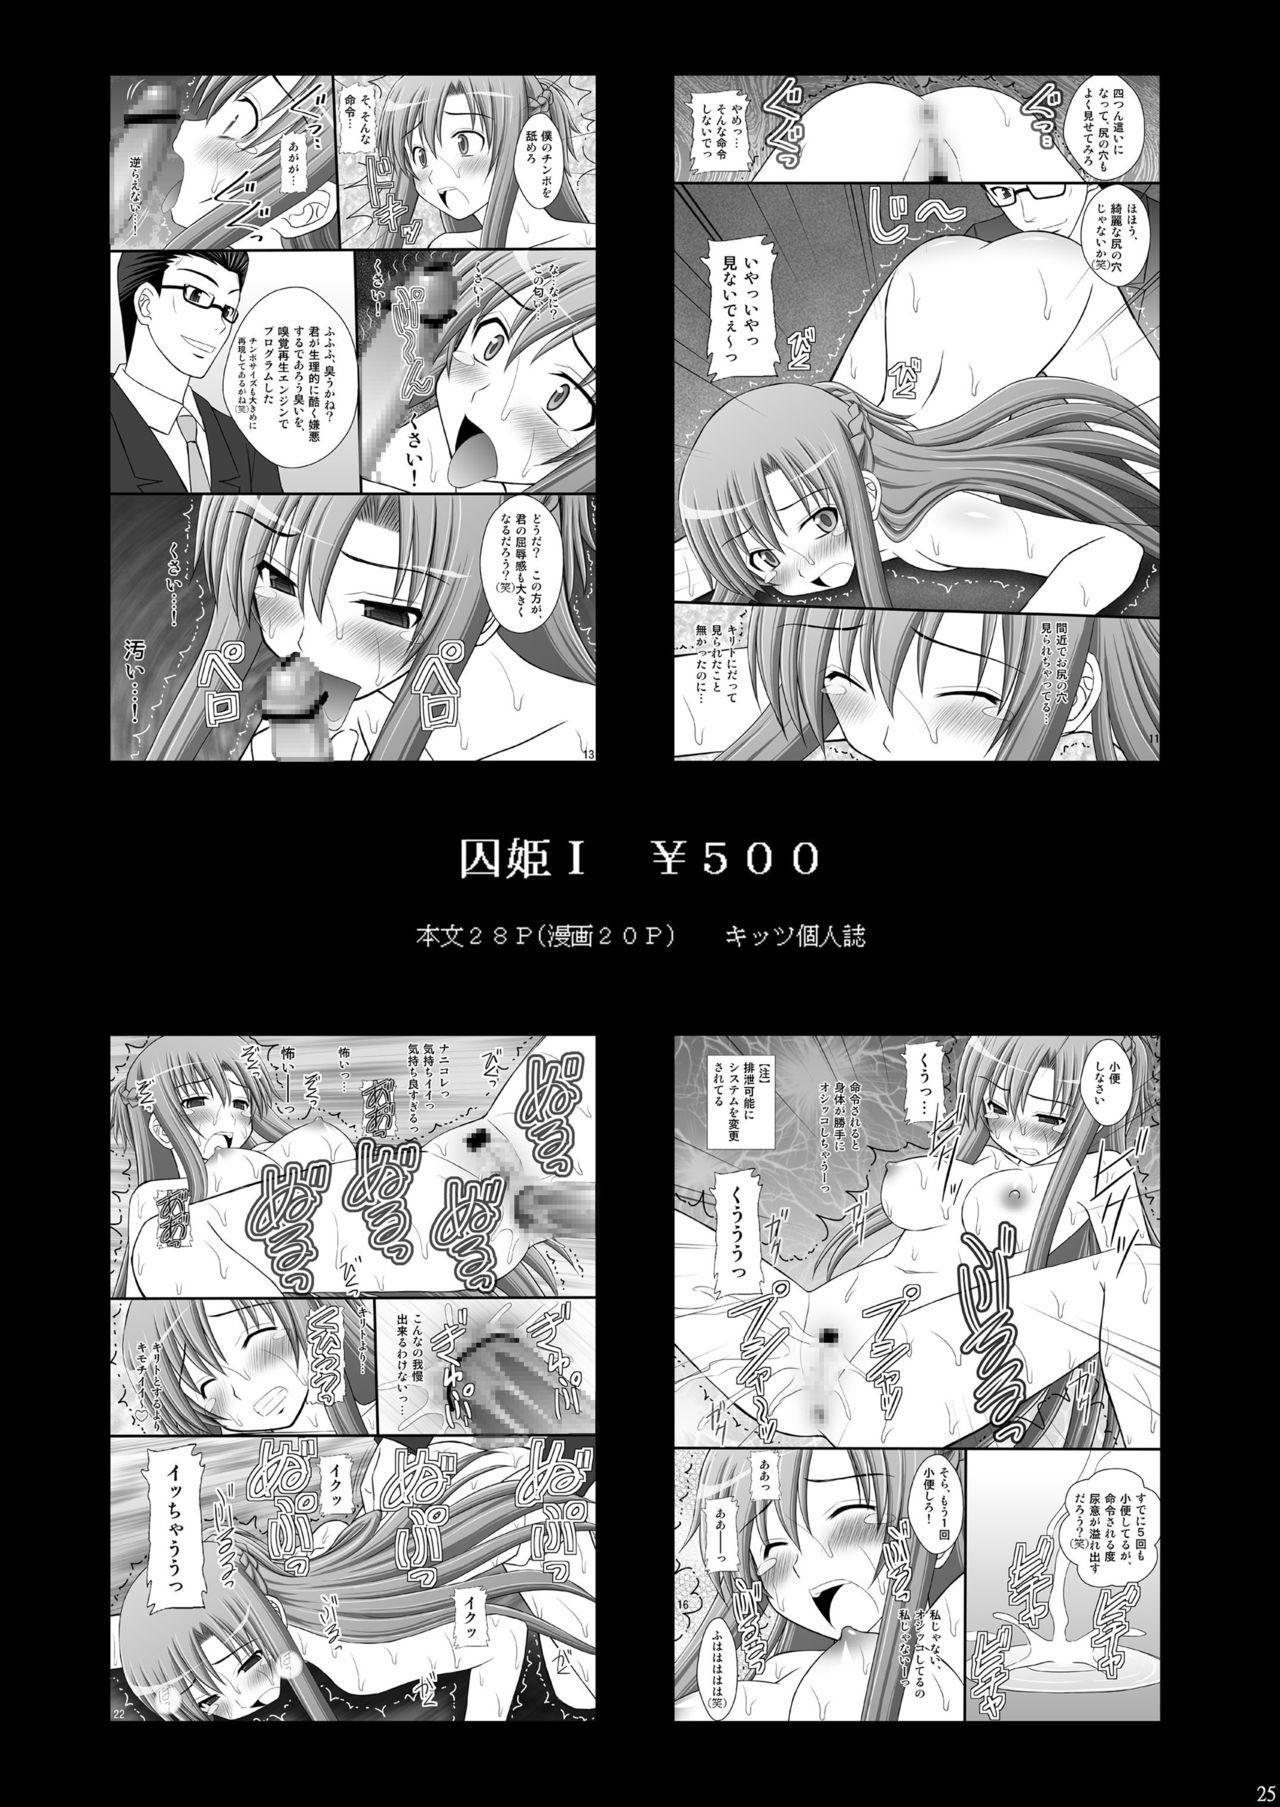 [Asanoya (Kittsu)] Toraware Hime III - Asuna Nakadashi 100-nin Dekiru ka na   Hostage Princess III (Sword Art Online) [English] [HypnoMangaEditor] [Digital] 23